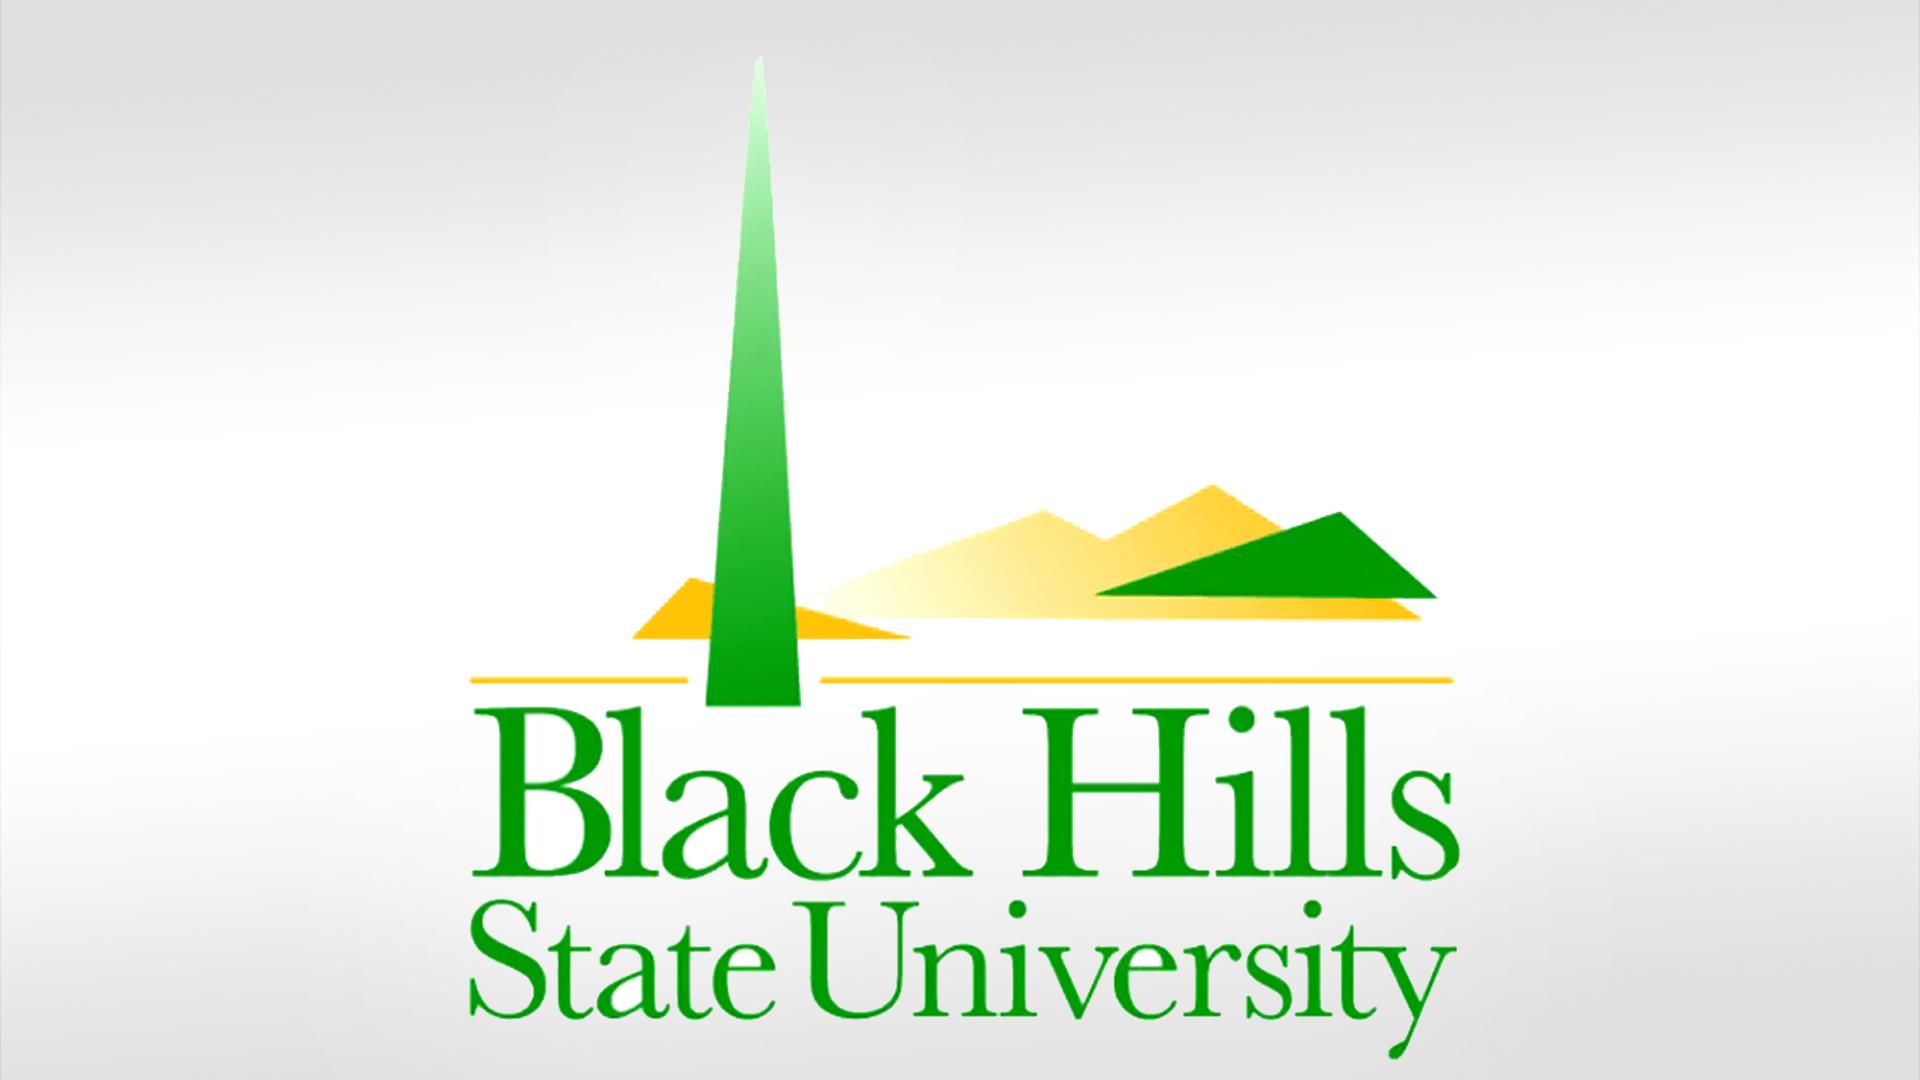 KELO Black Hills State University logo